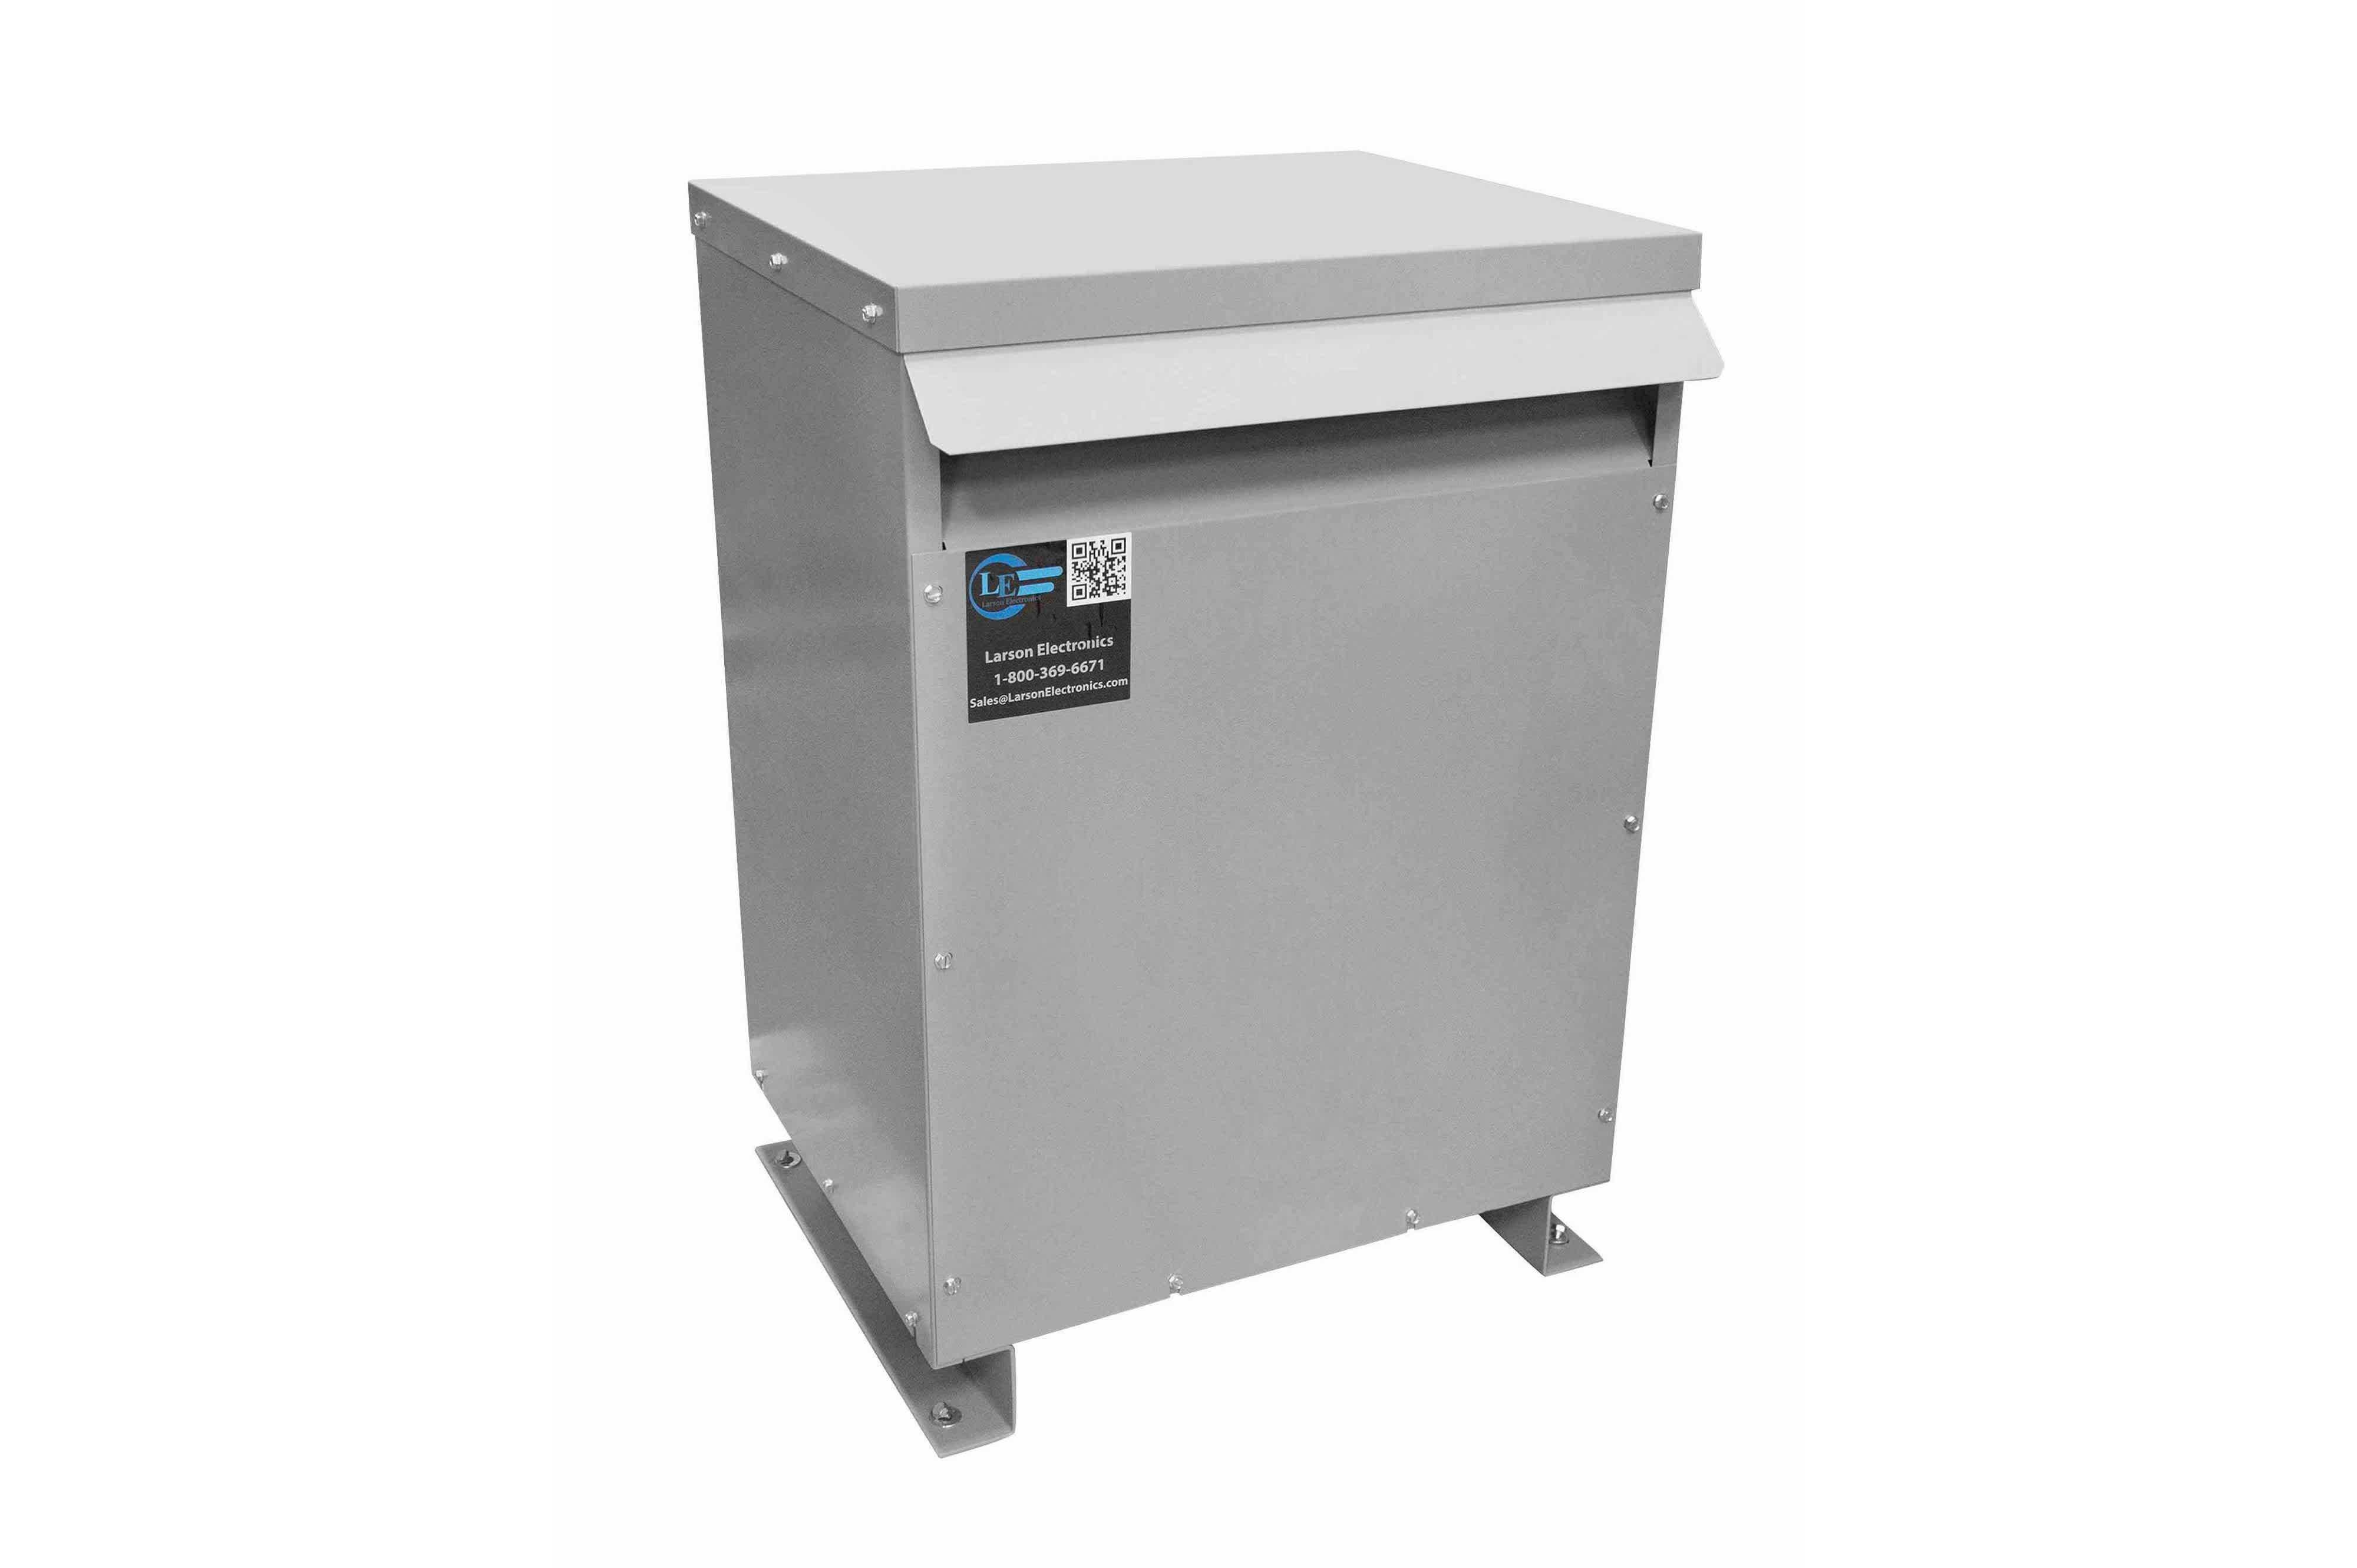 47.5 kVA 3PH Isolation Transformer, 575V Wye Primary, 480V Delta Secondary, N3R, Ventilated, 60 Hz